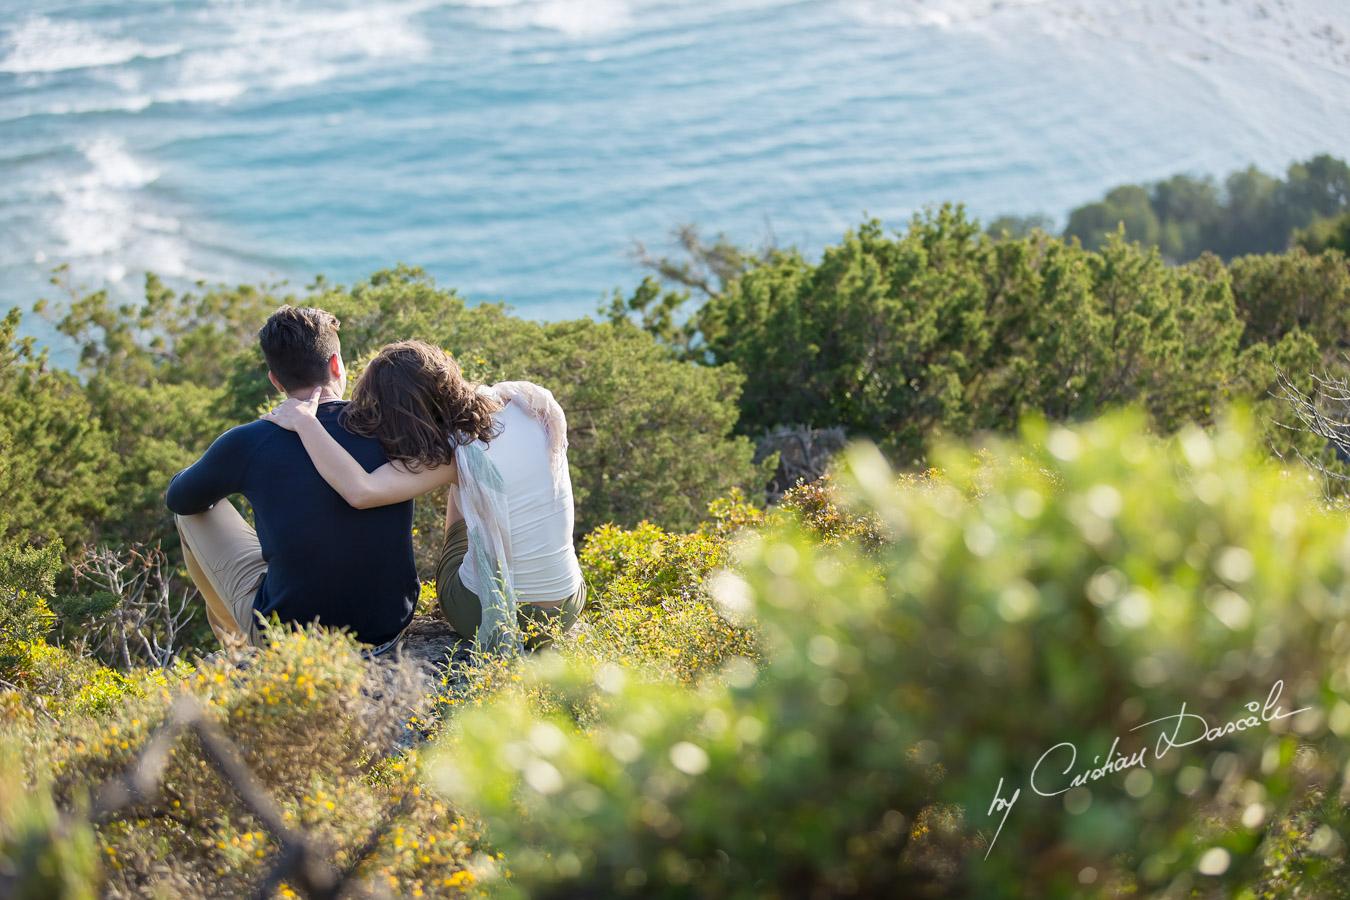 Love at first sight - Karen & Martins at Kurion Cyprus - 12